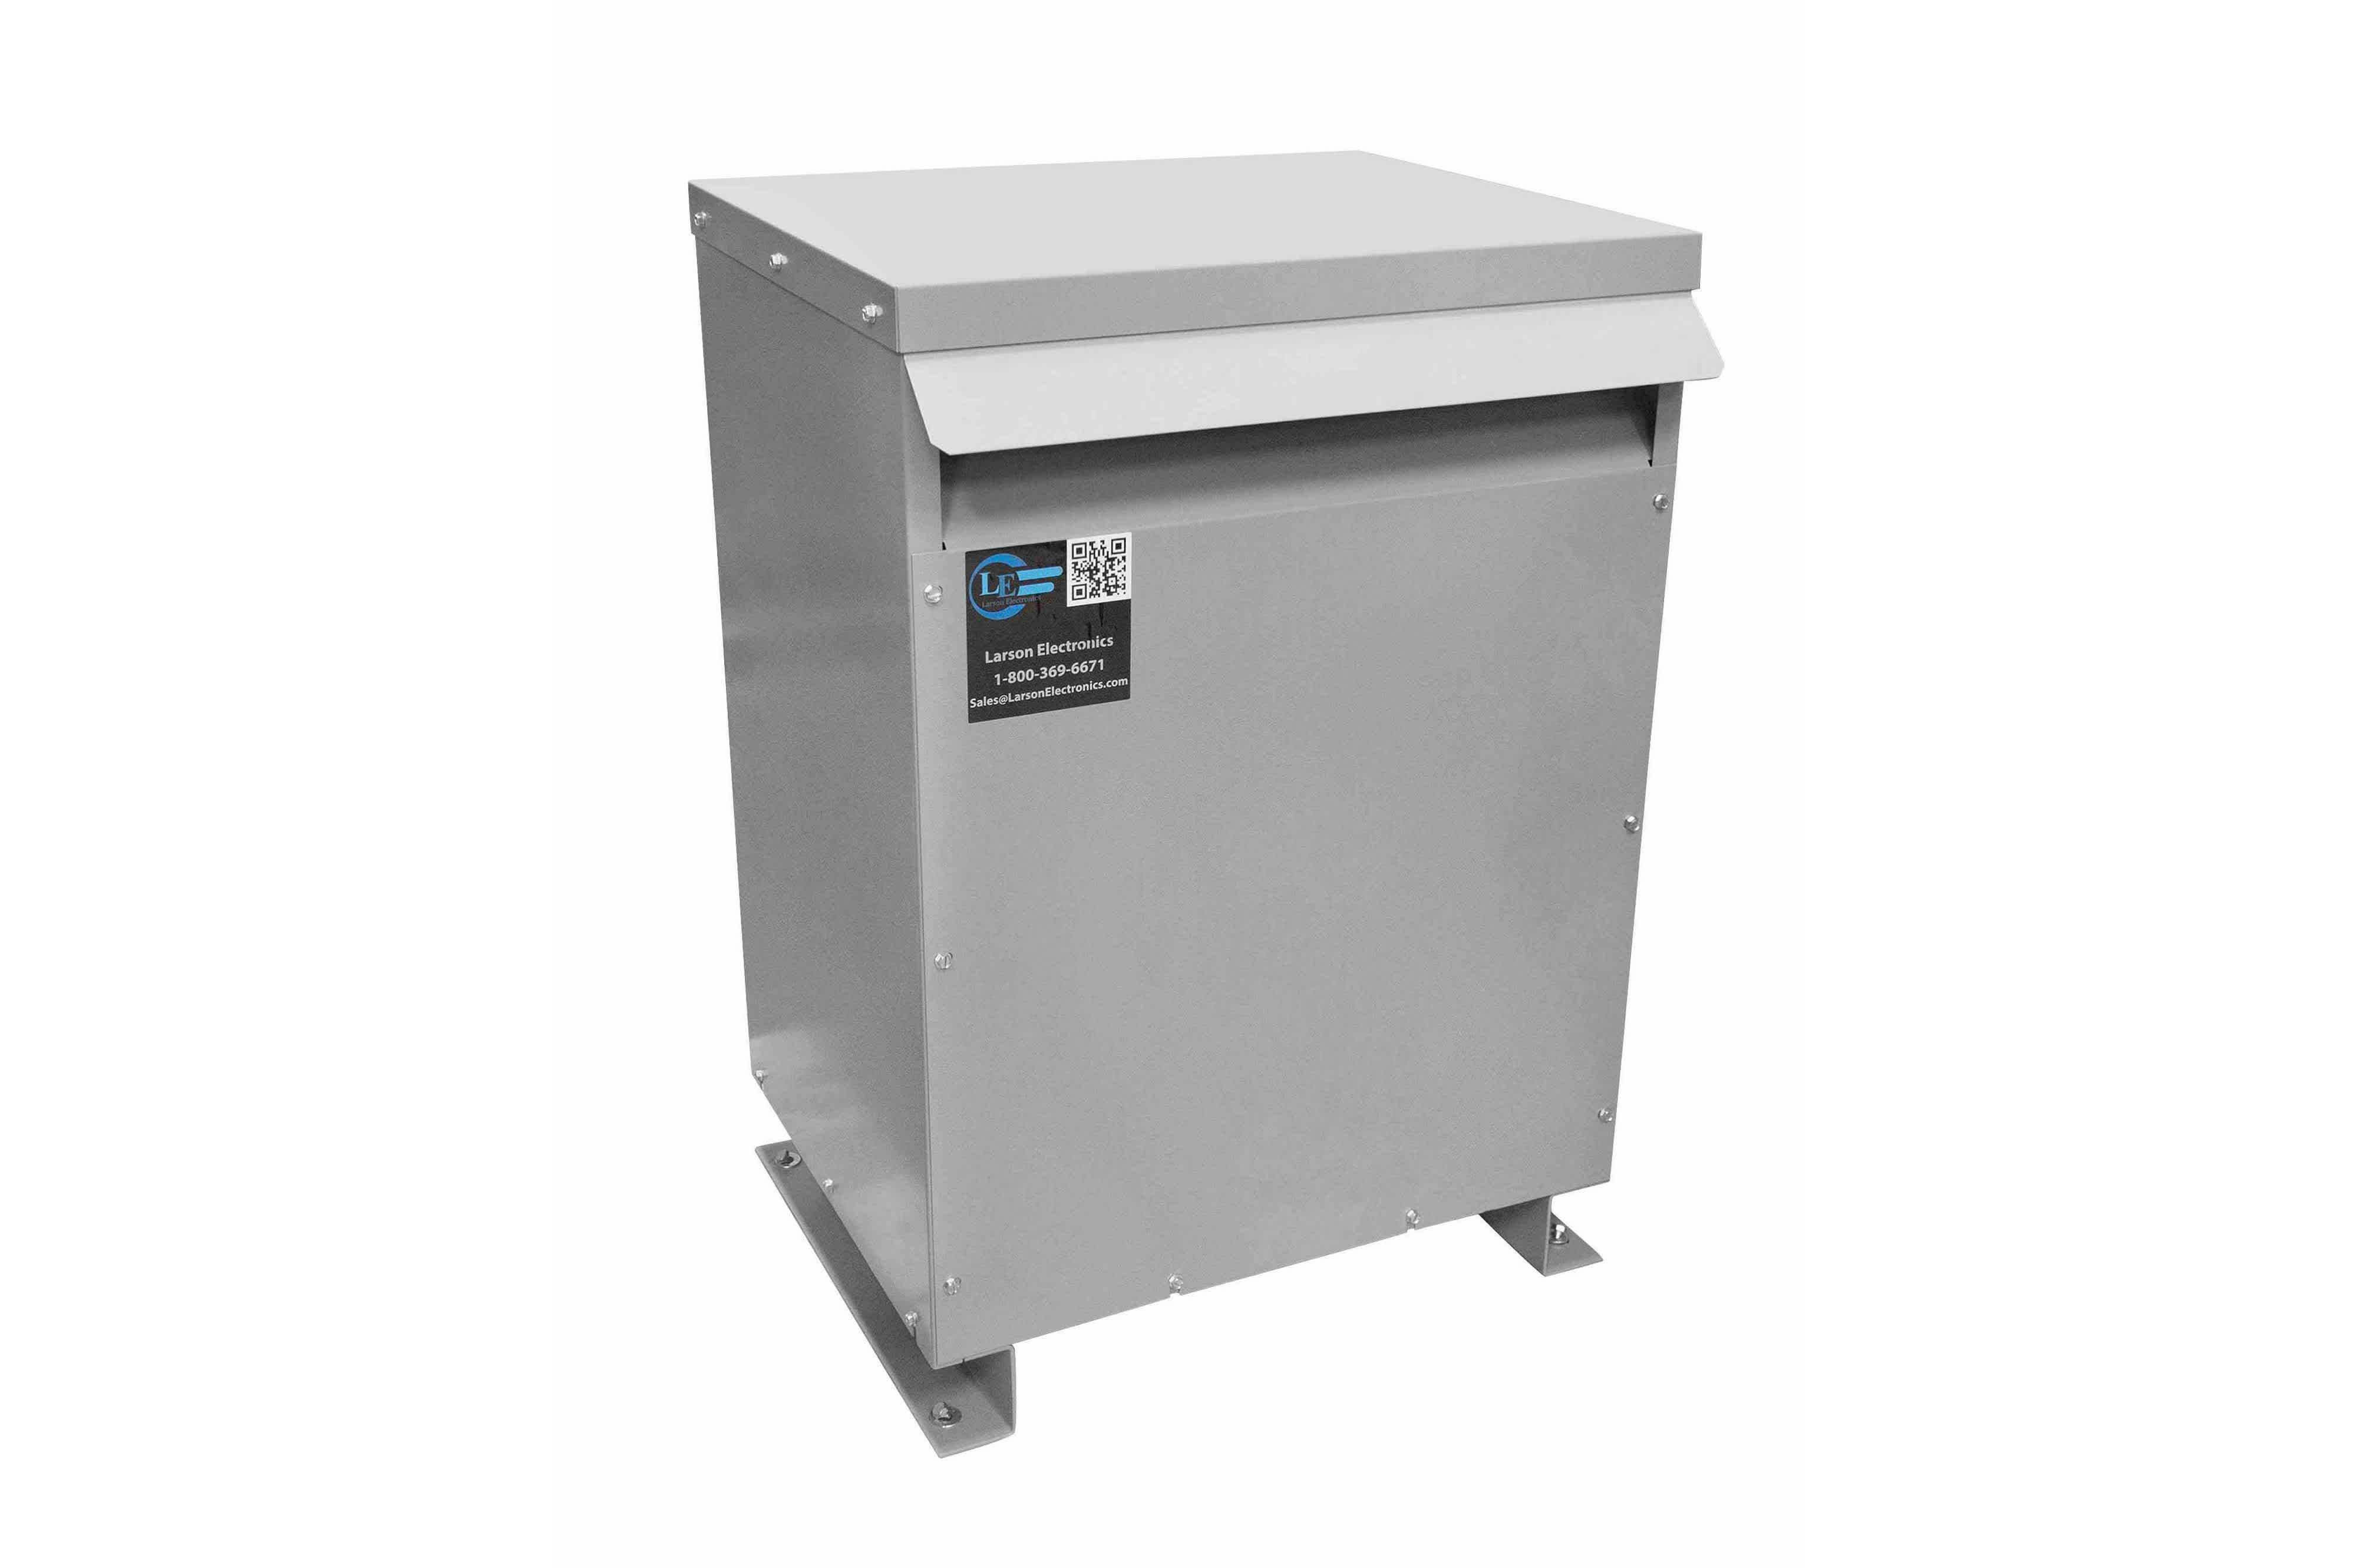 28 kVA 3PH Isolation Transformer, 380V Wye Primary, 208Y/120 Wye-N Secondary, N3R, Ventilated, 60 Hz